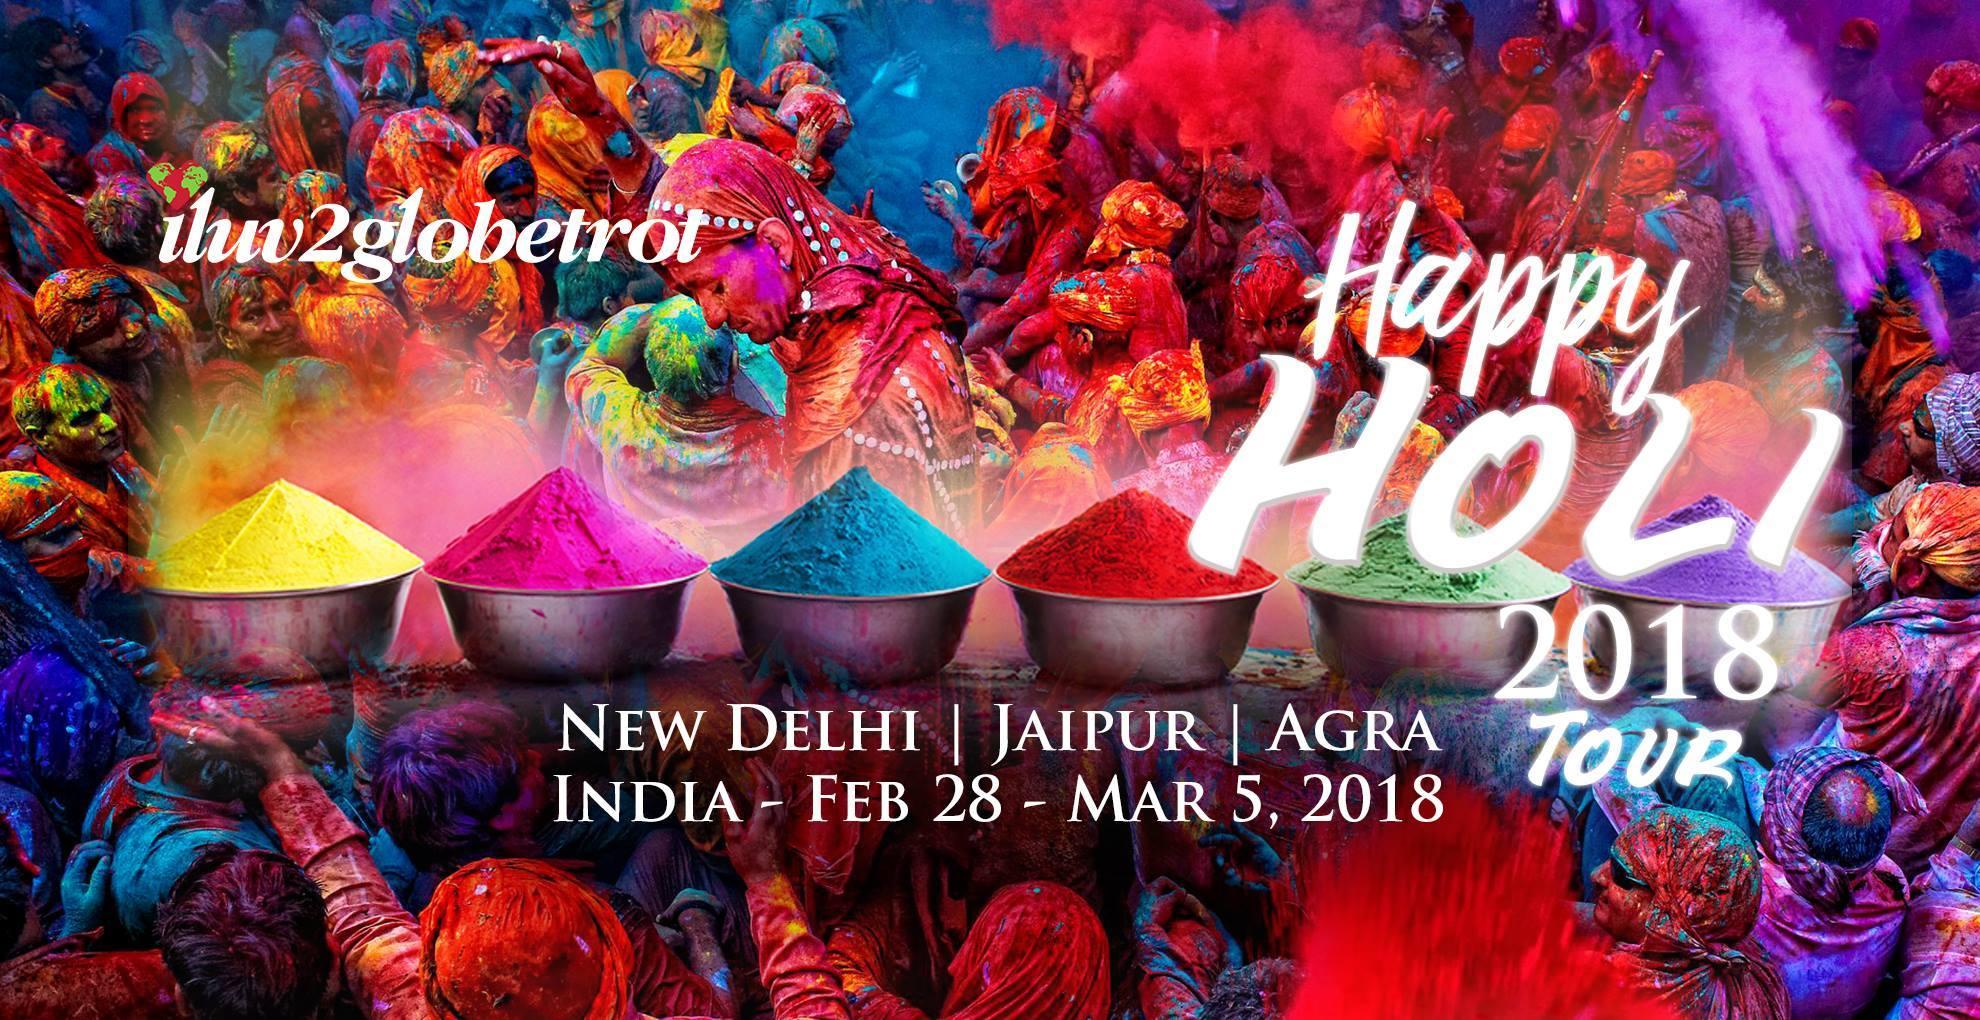 The Holi Festival Tour 2018